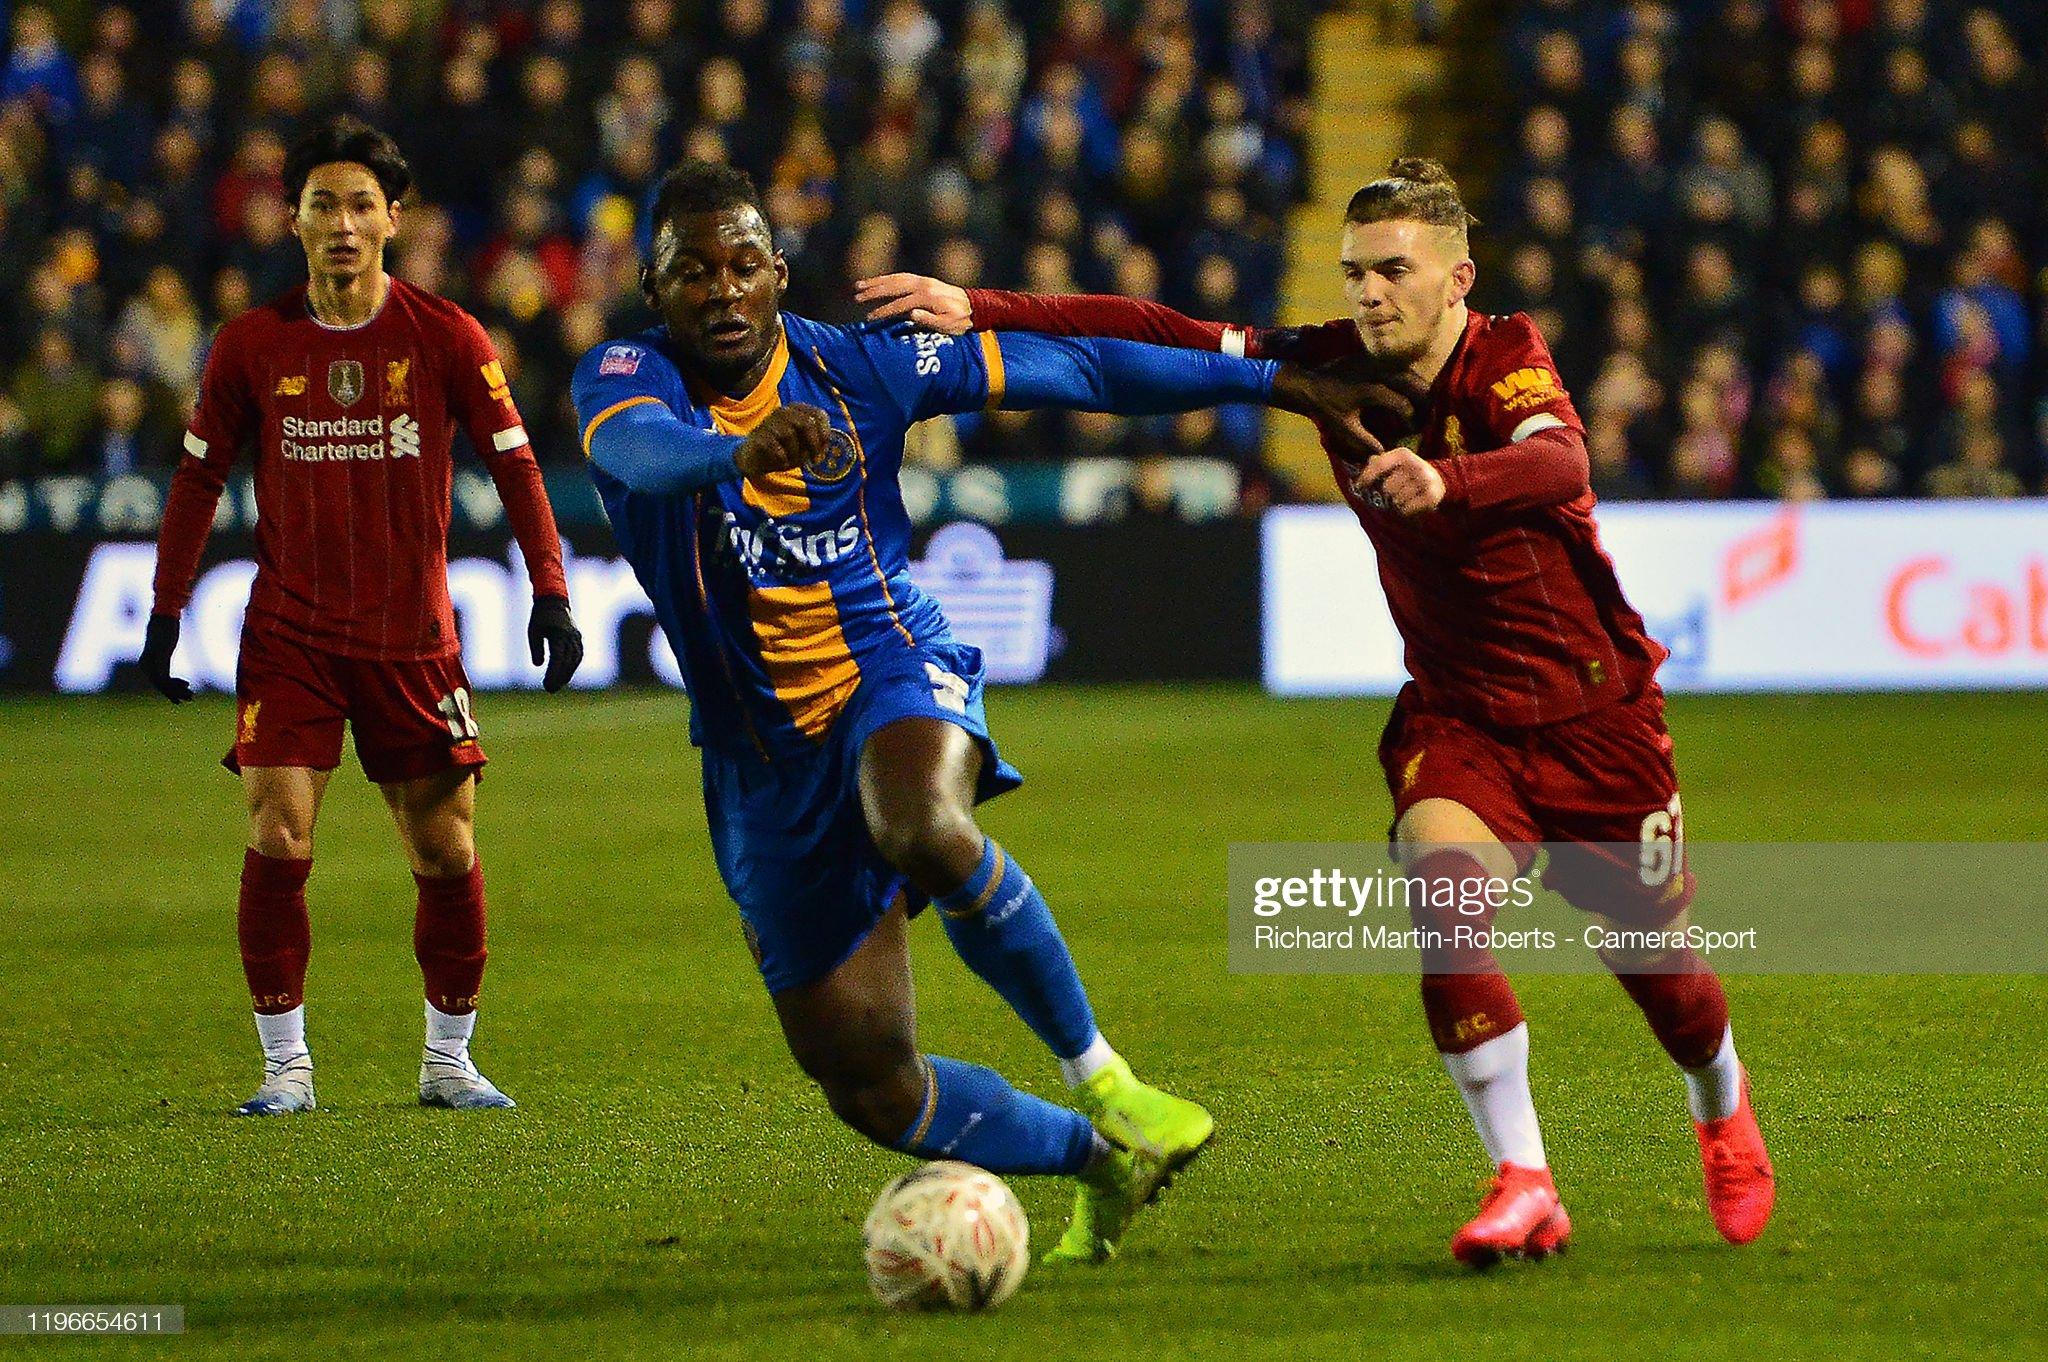 Liverpool v Shrewsbury preview, prediction and odds